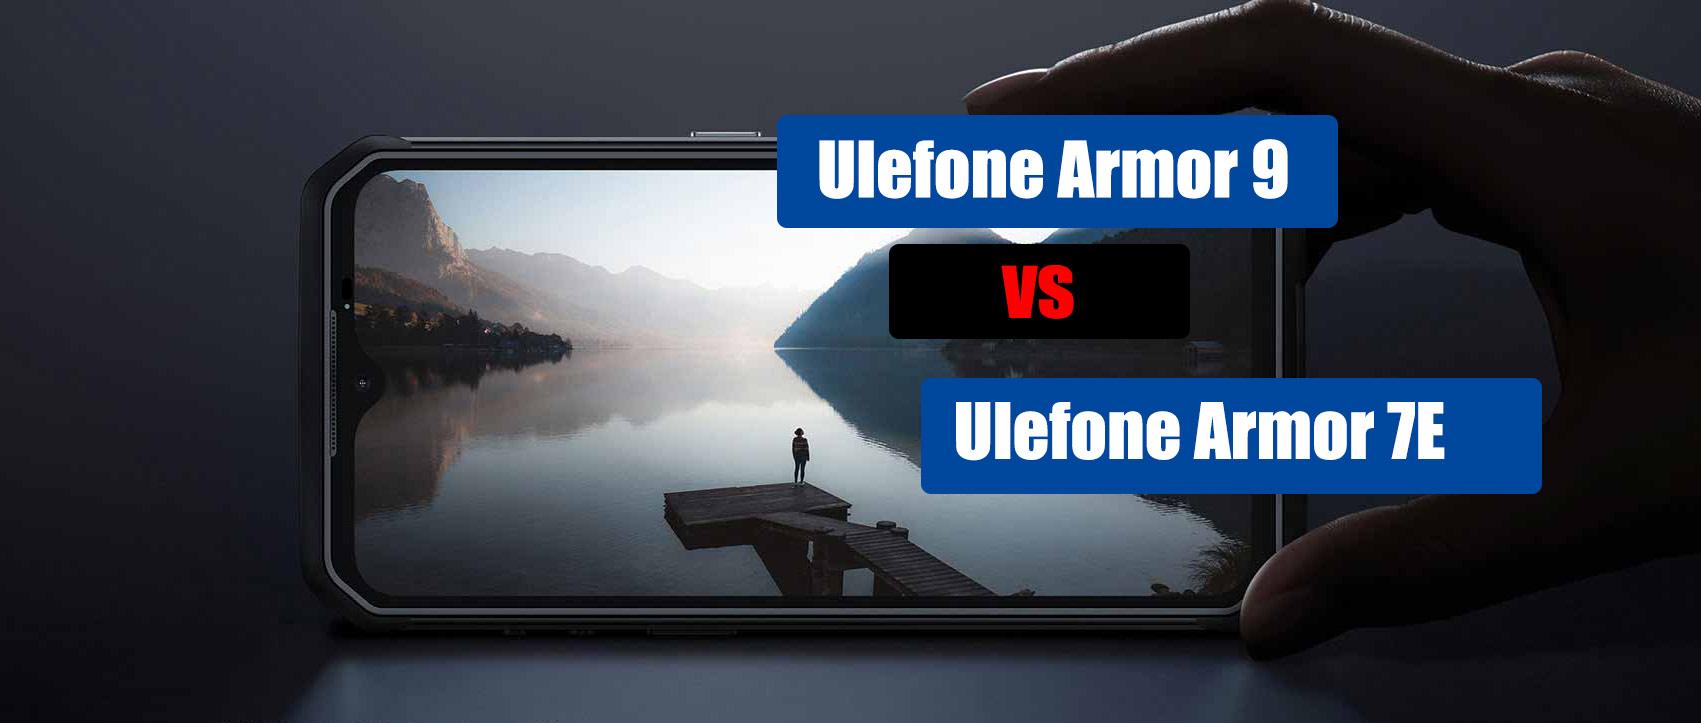 Ulefone Armor 9 VS Ulefone Armor 7E